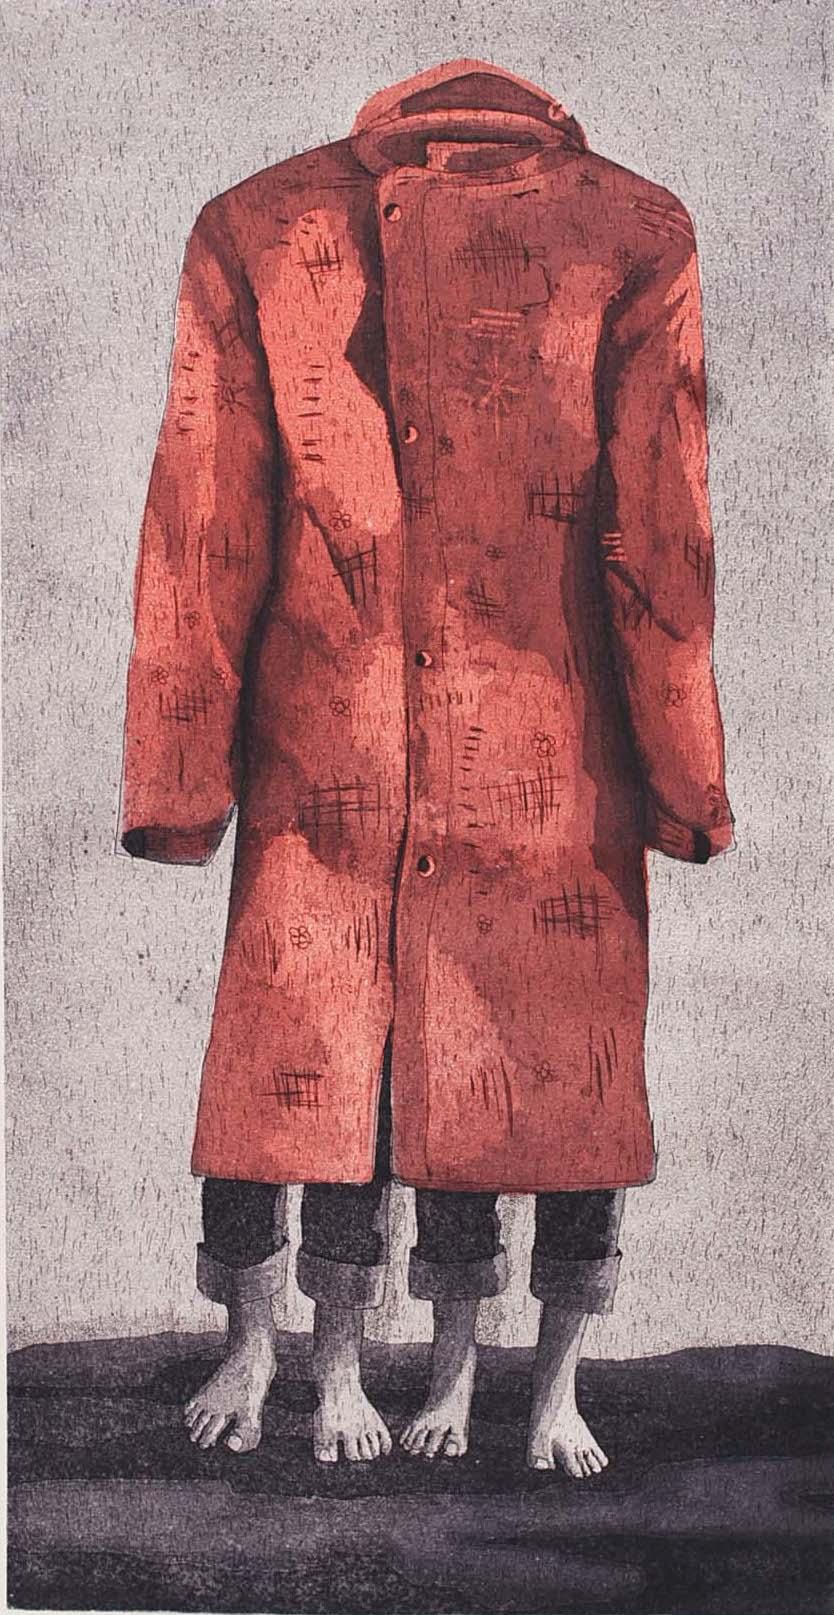 In The Same Rain Coat